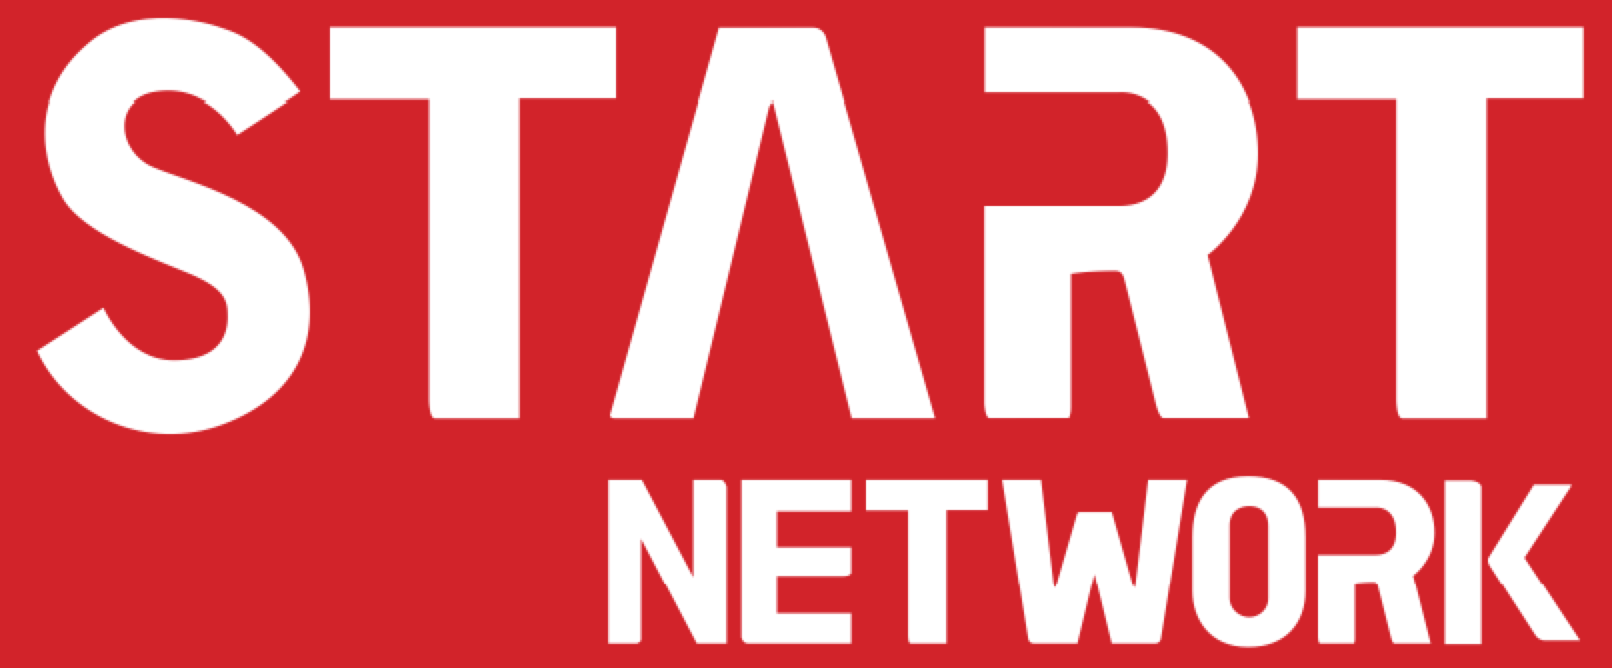 start-network-logo.png